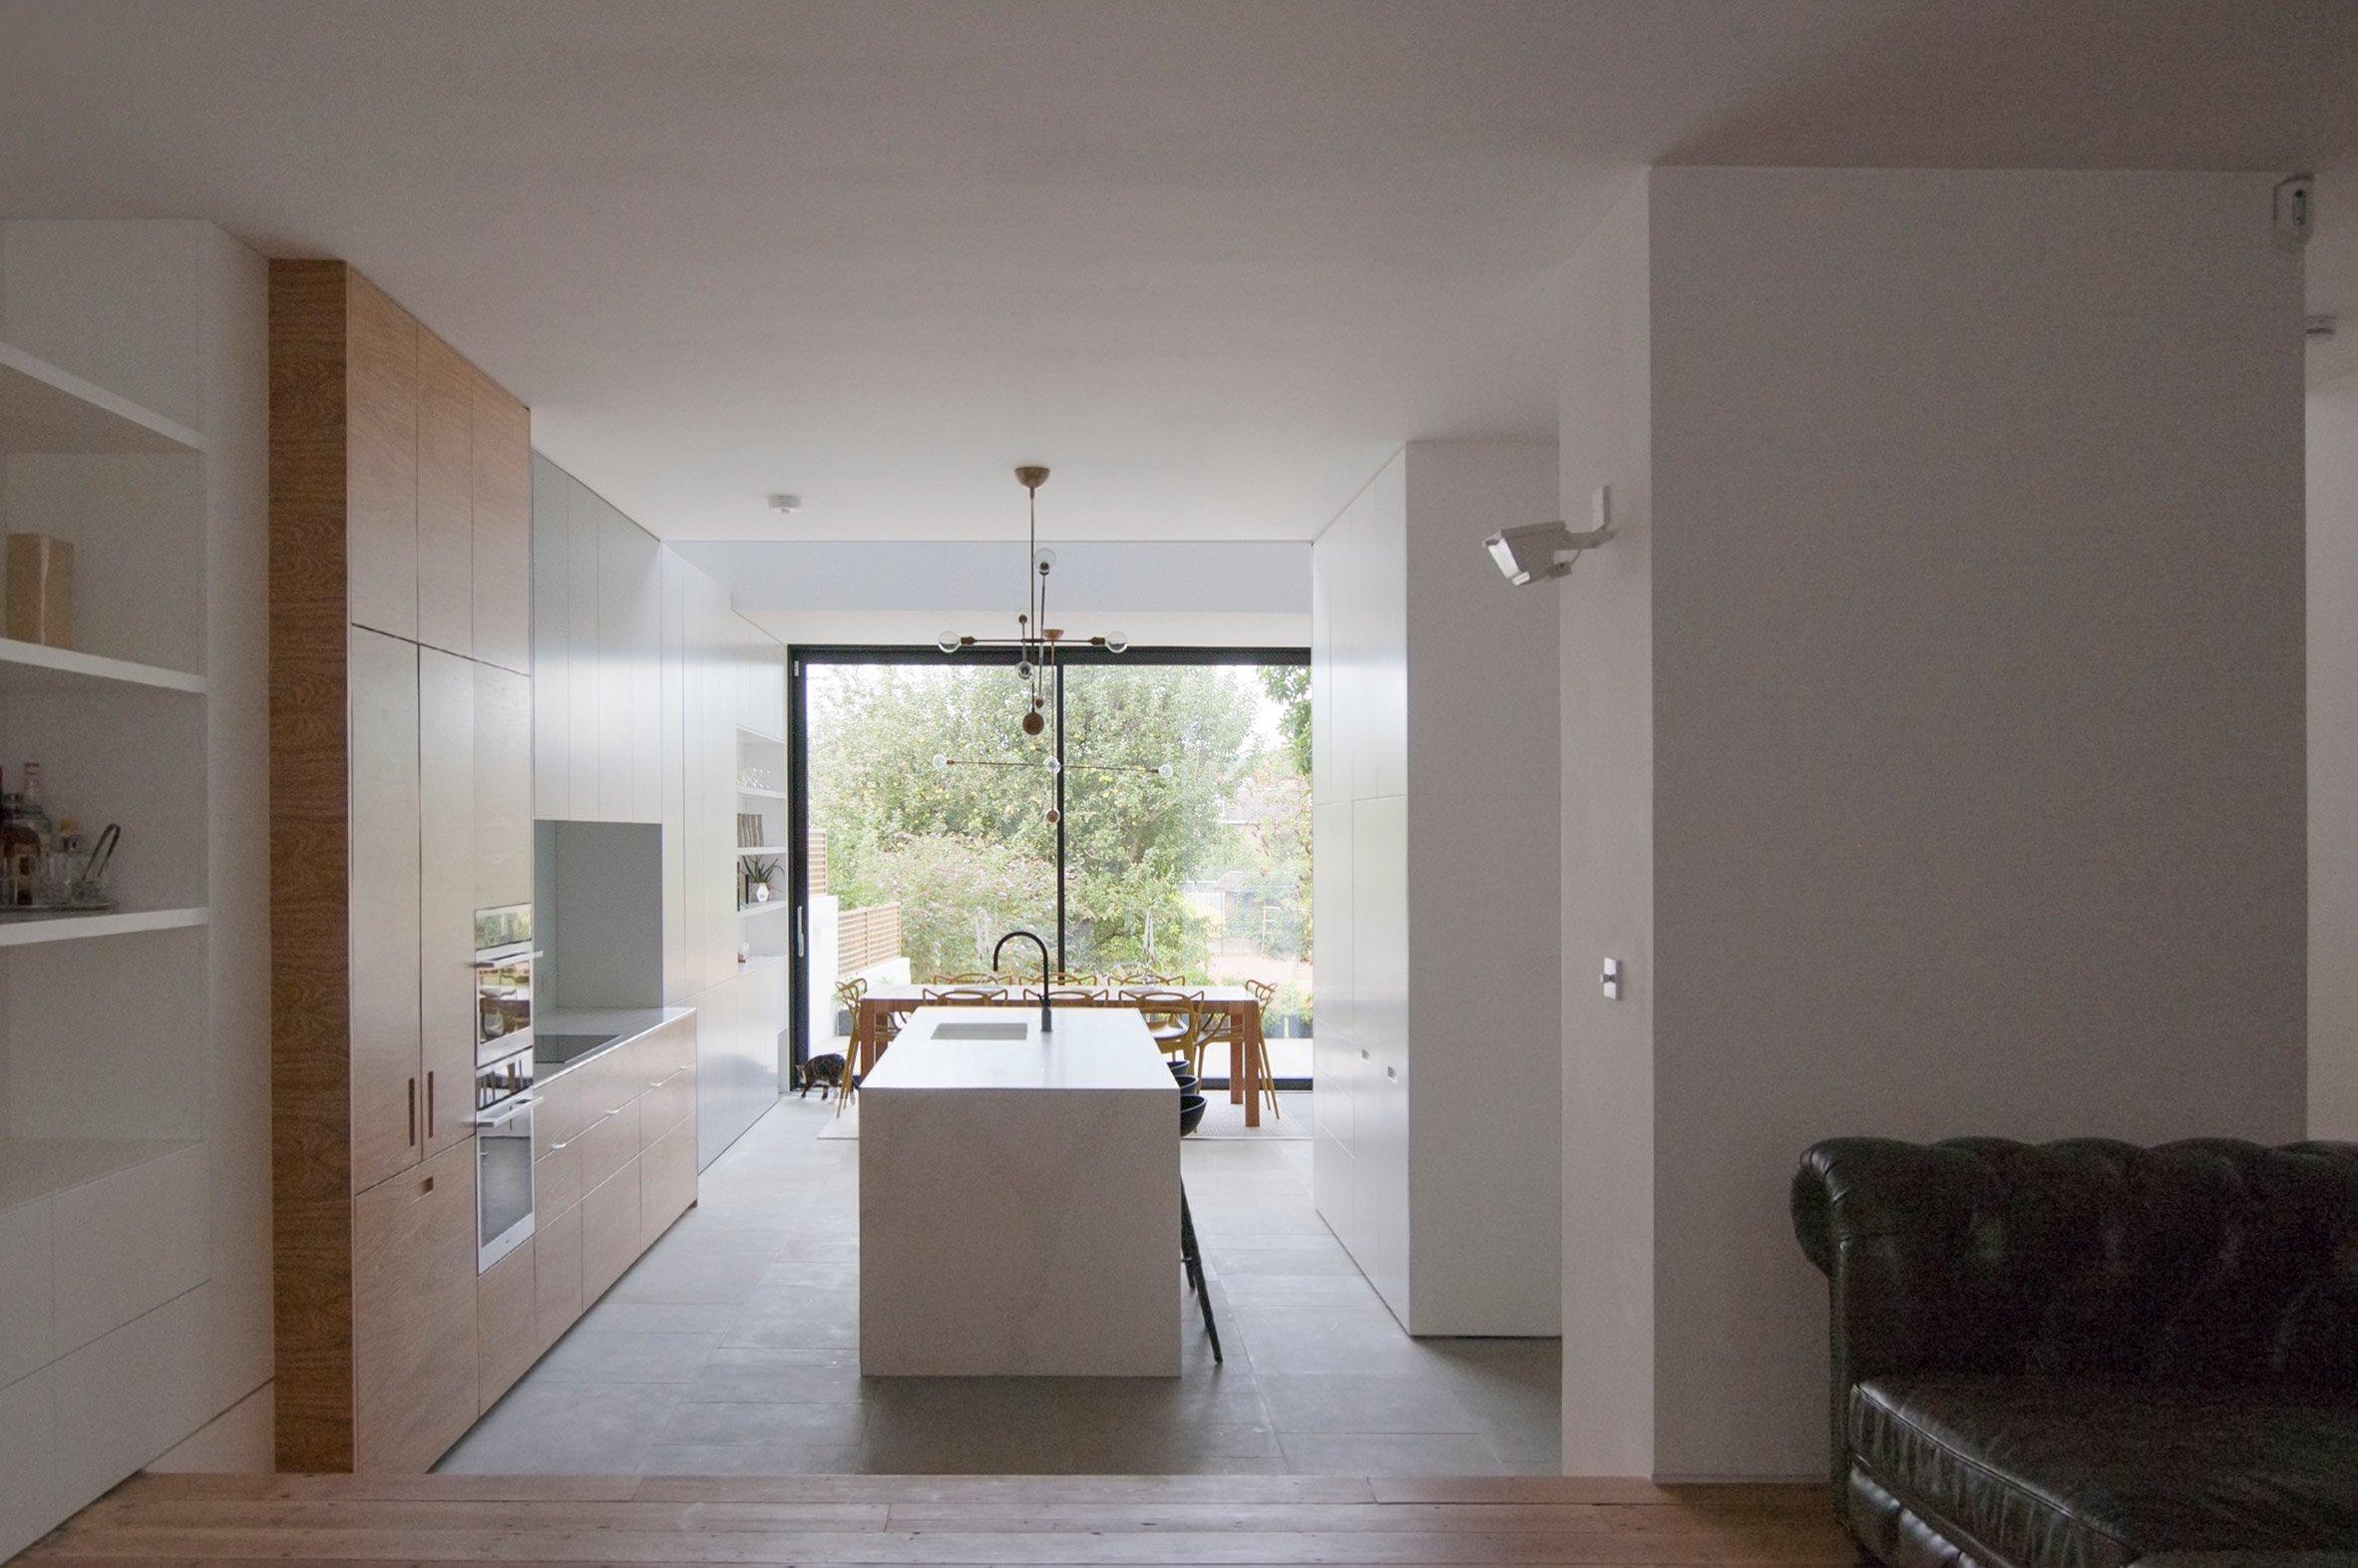 architecture-square-residence-interiors-design-studia-osnovadesign-osnova-poltava_04